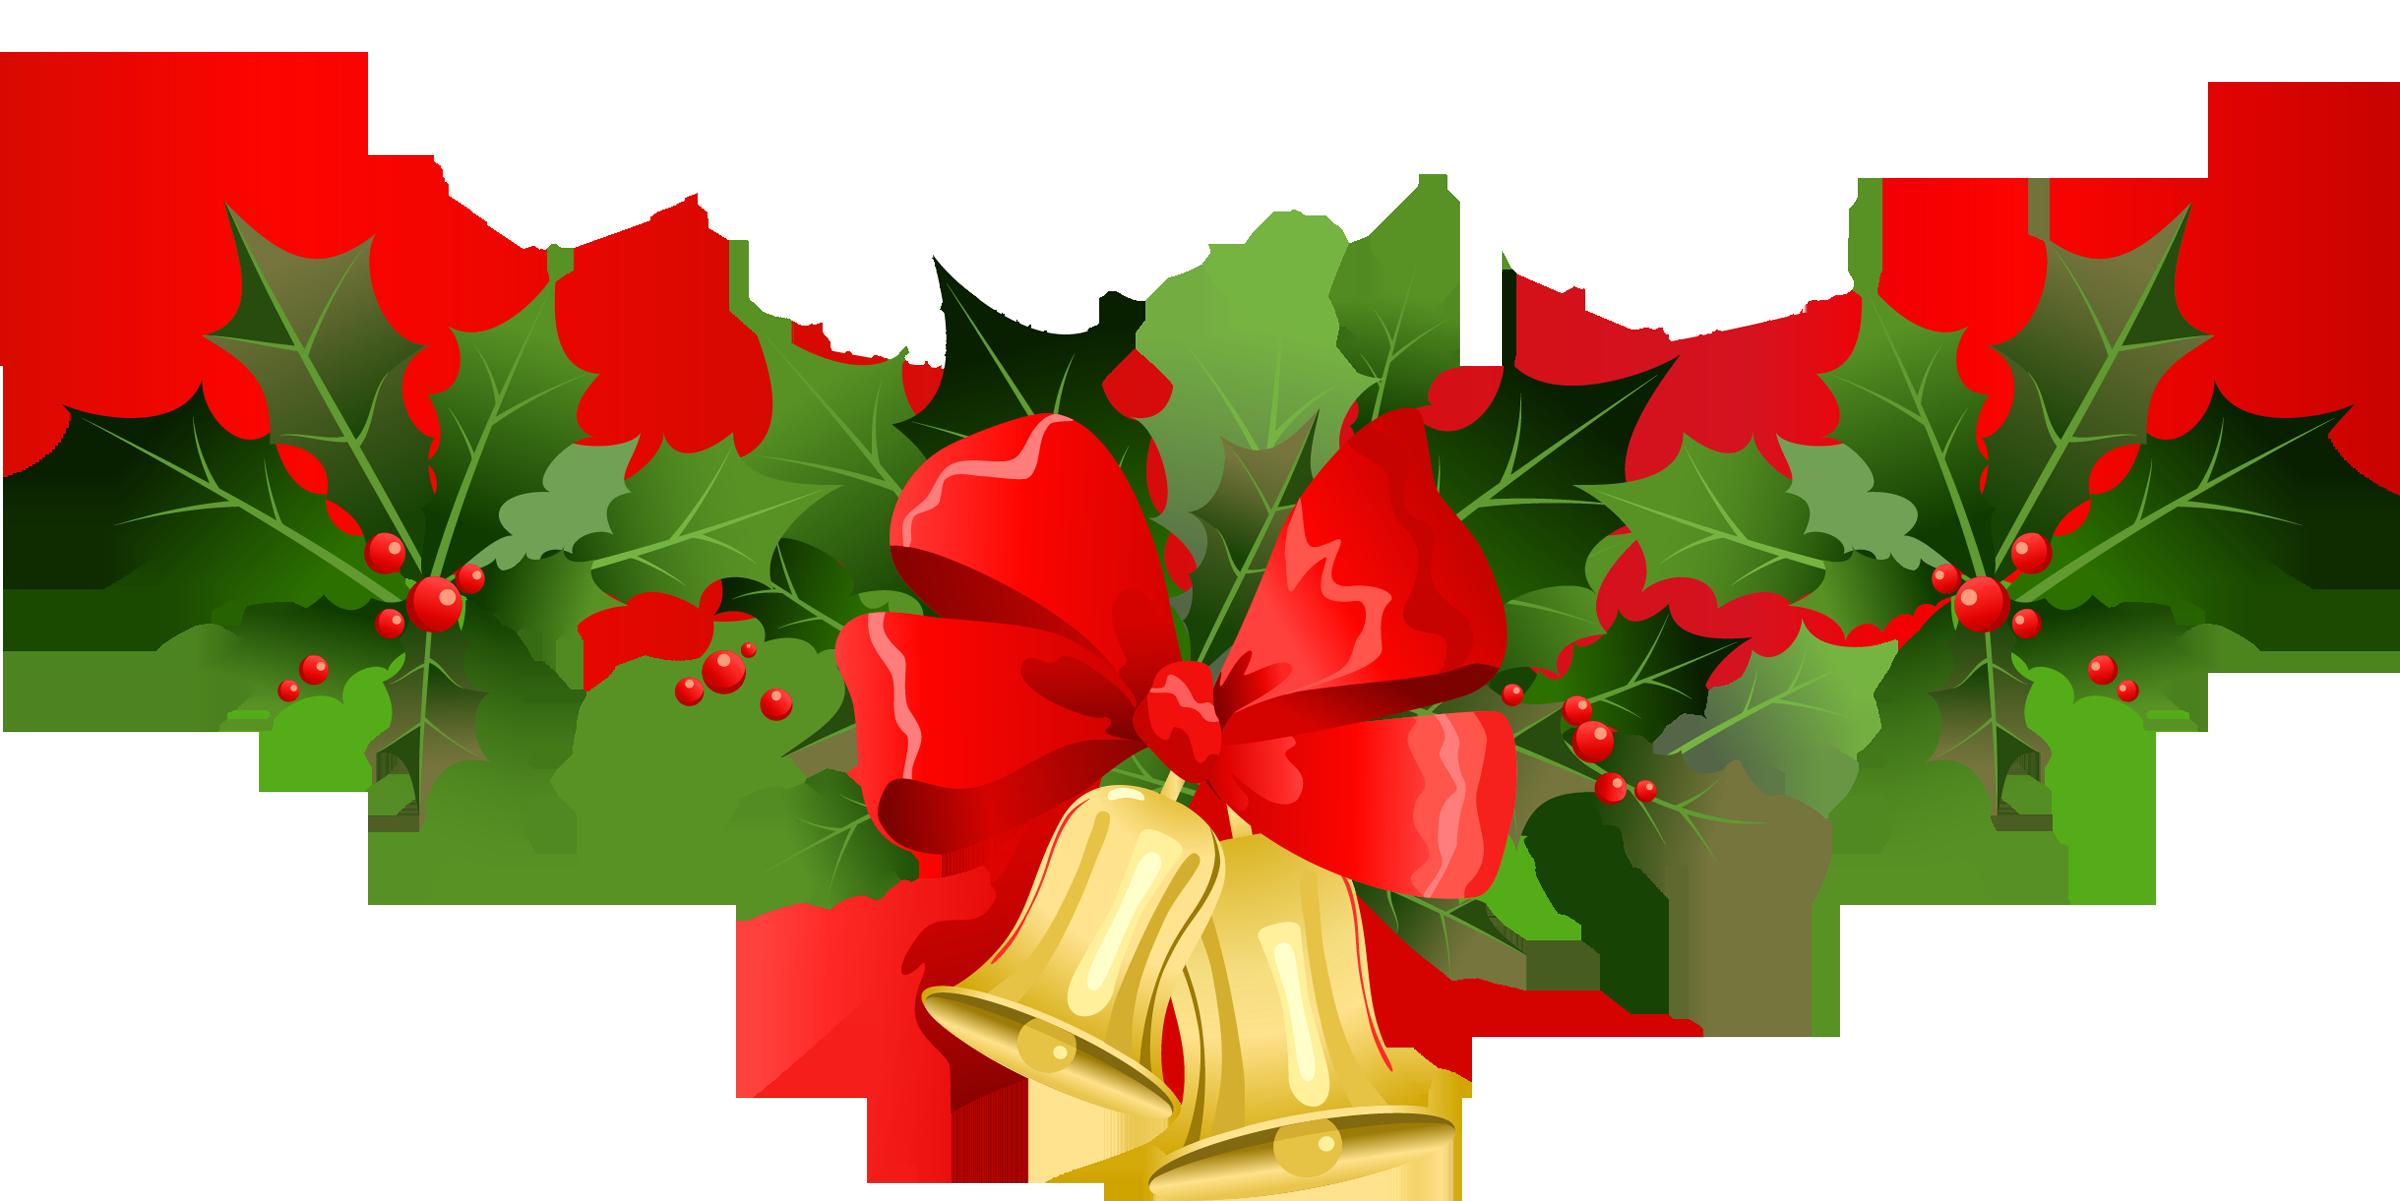 Free Christmas Clip Art On ... Christmas-Free Christmas Clip Art on ... Christmas decoration PNG-14